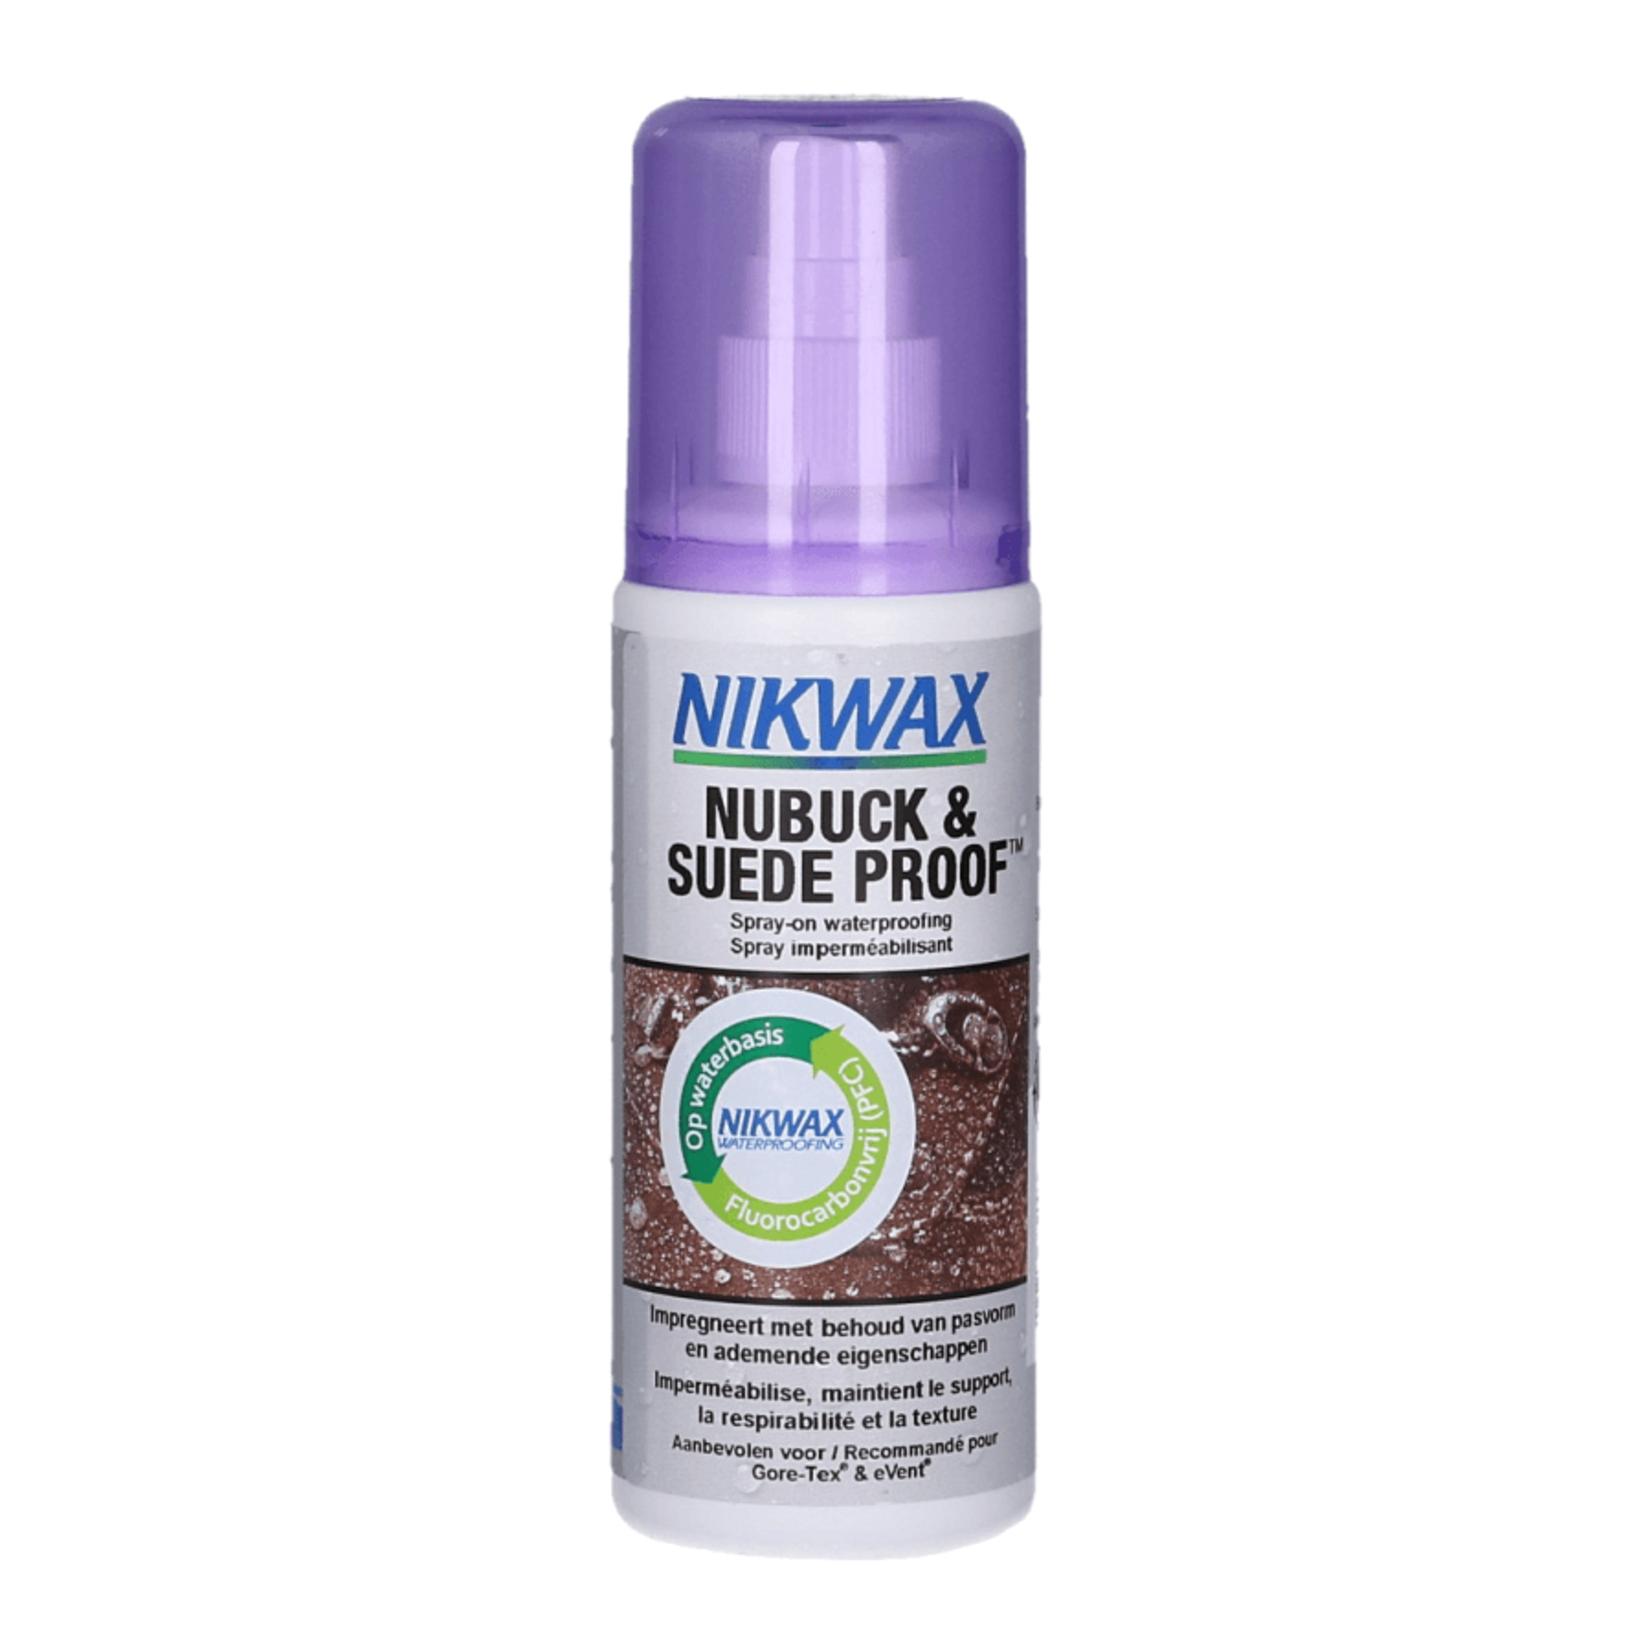 Nikwax NikWax nubuck&suede proof